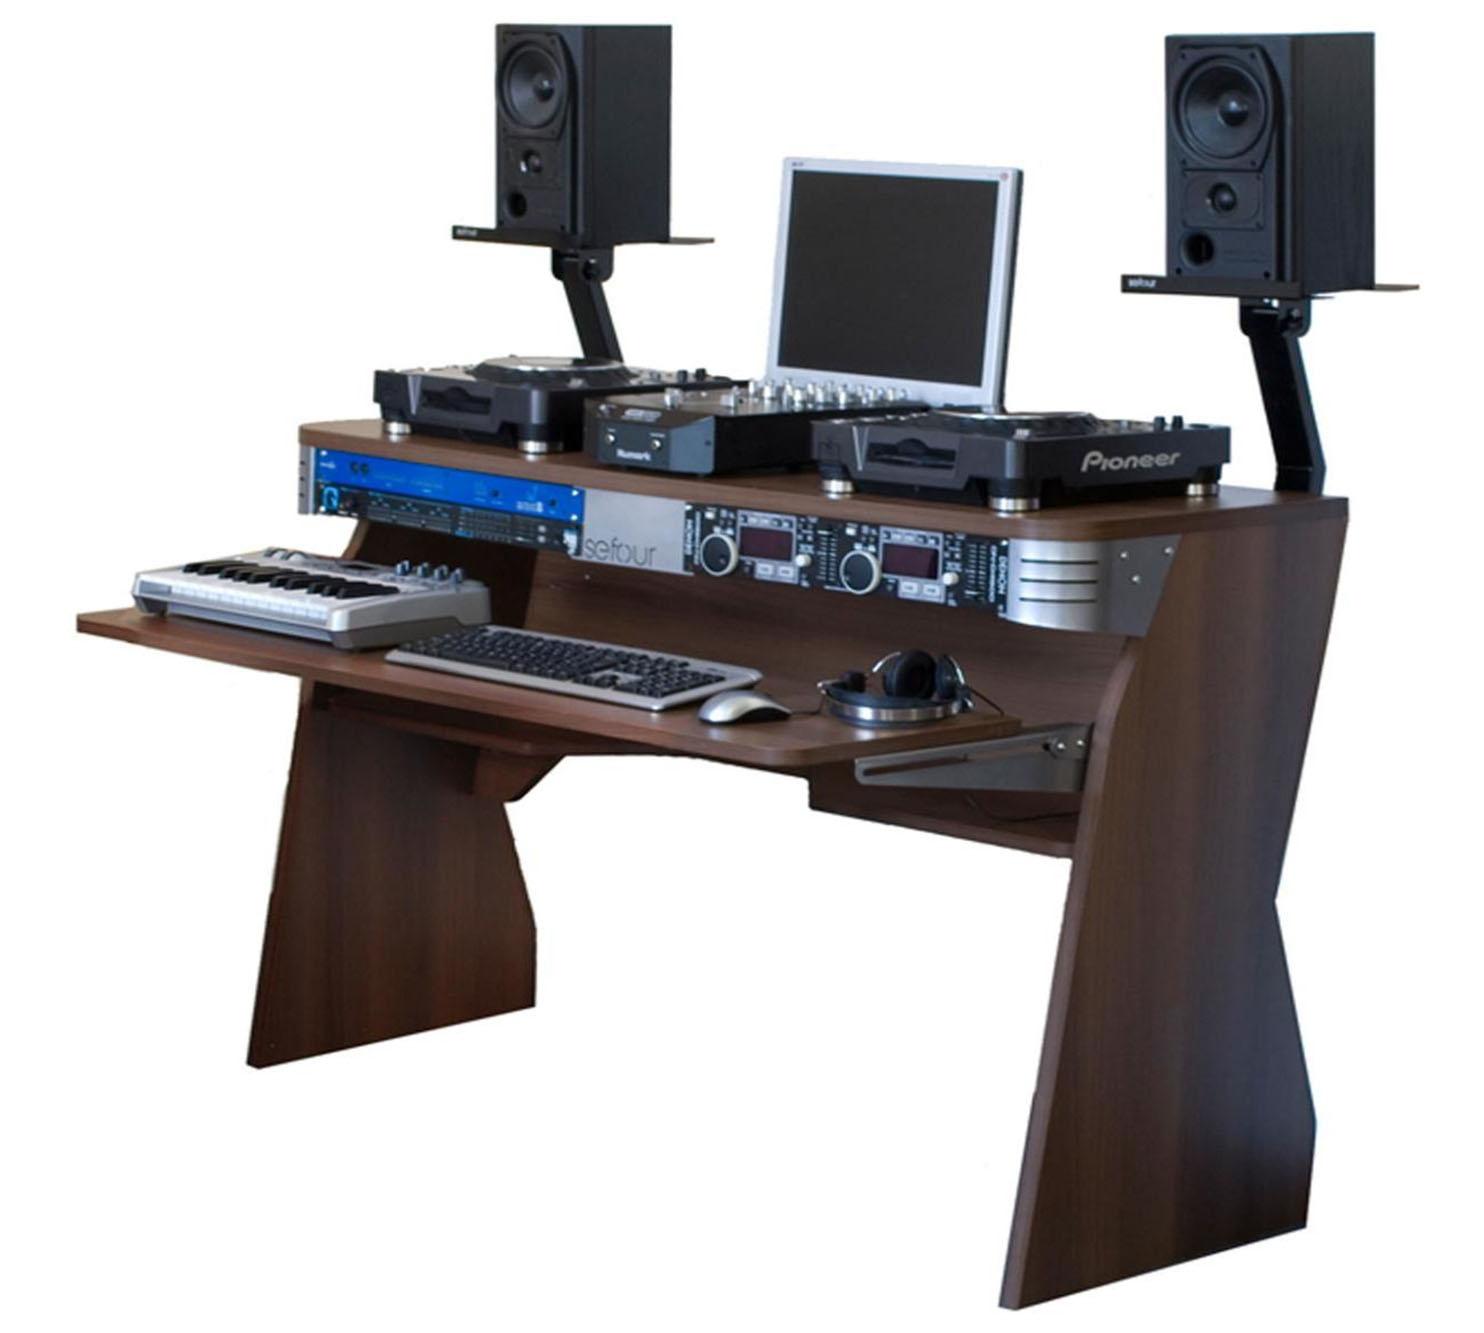 sefour x60 recording studio dj console free shipping. Black Bedroom Furniture Sets. Home Design Ideas